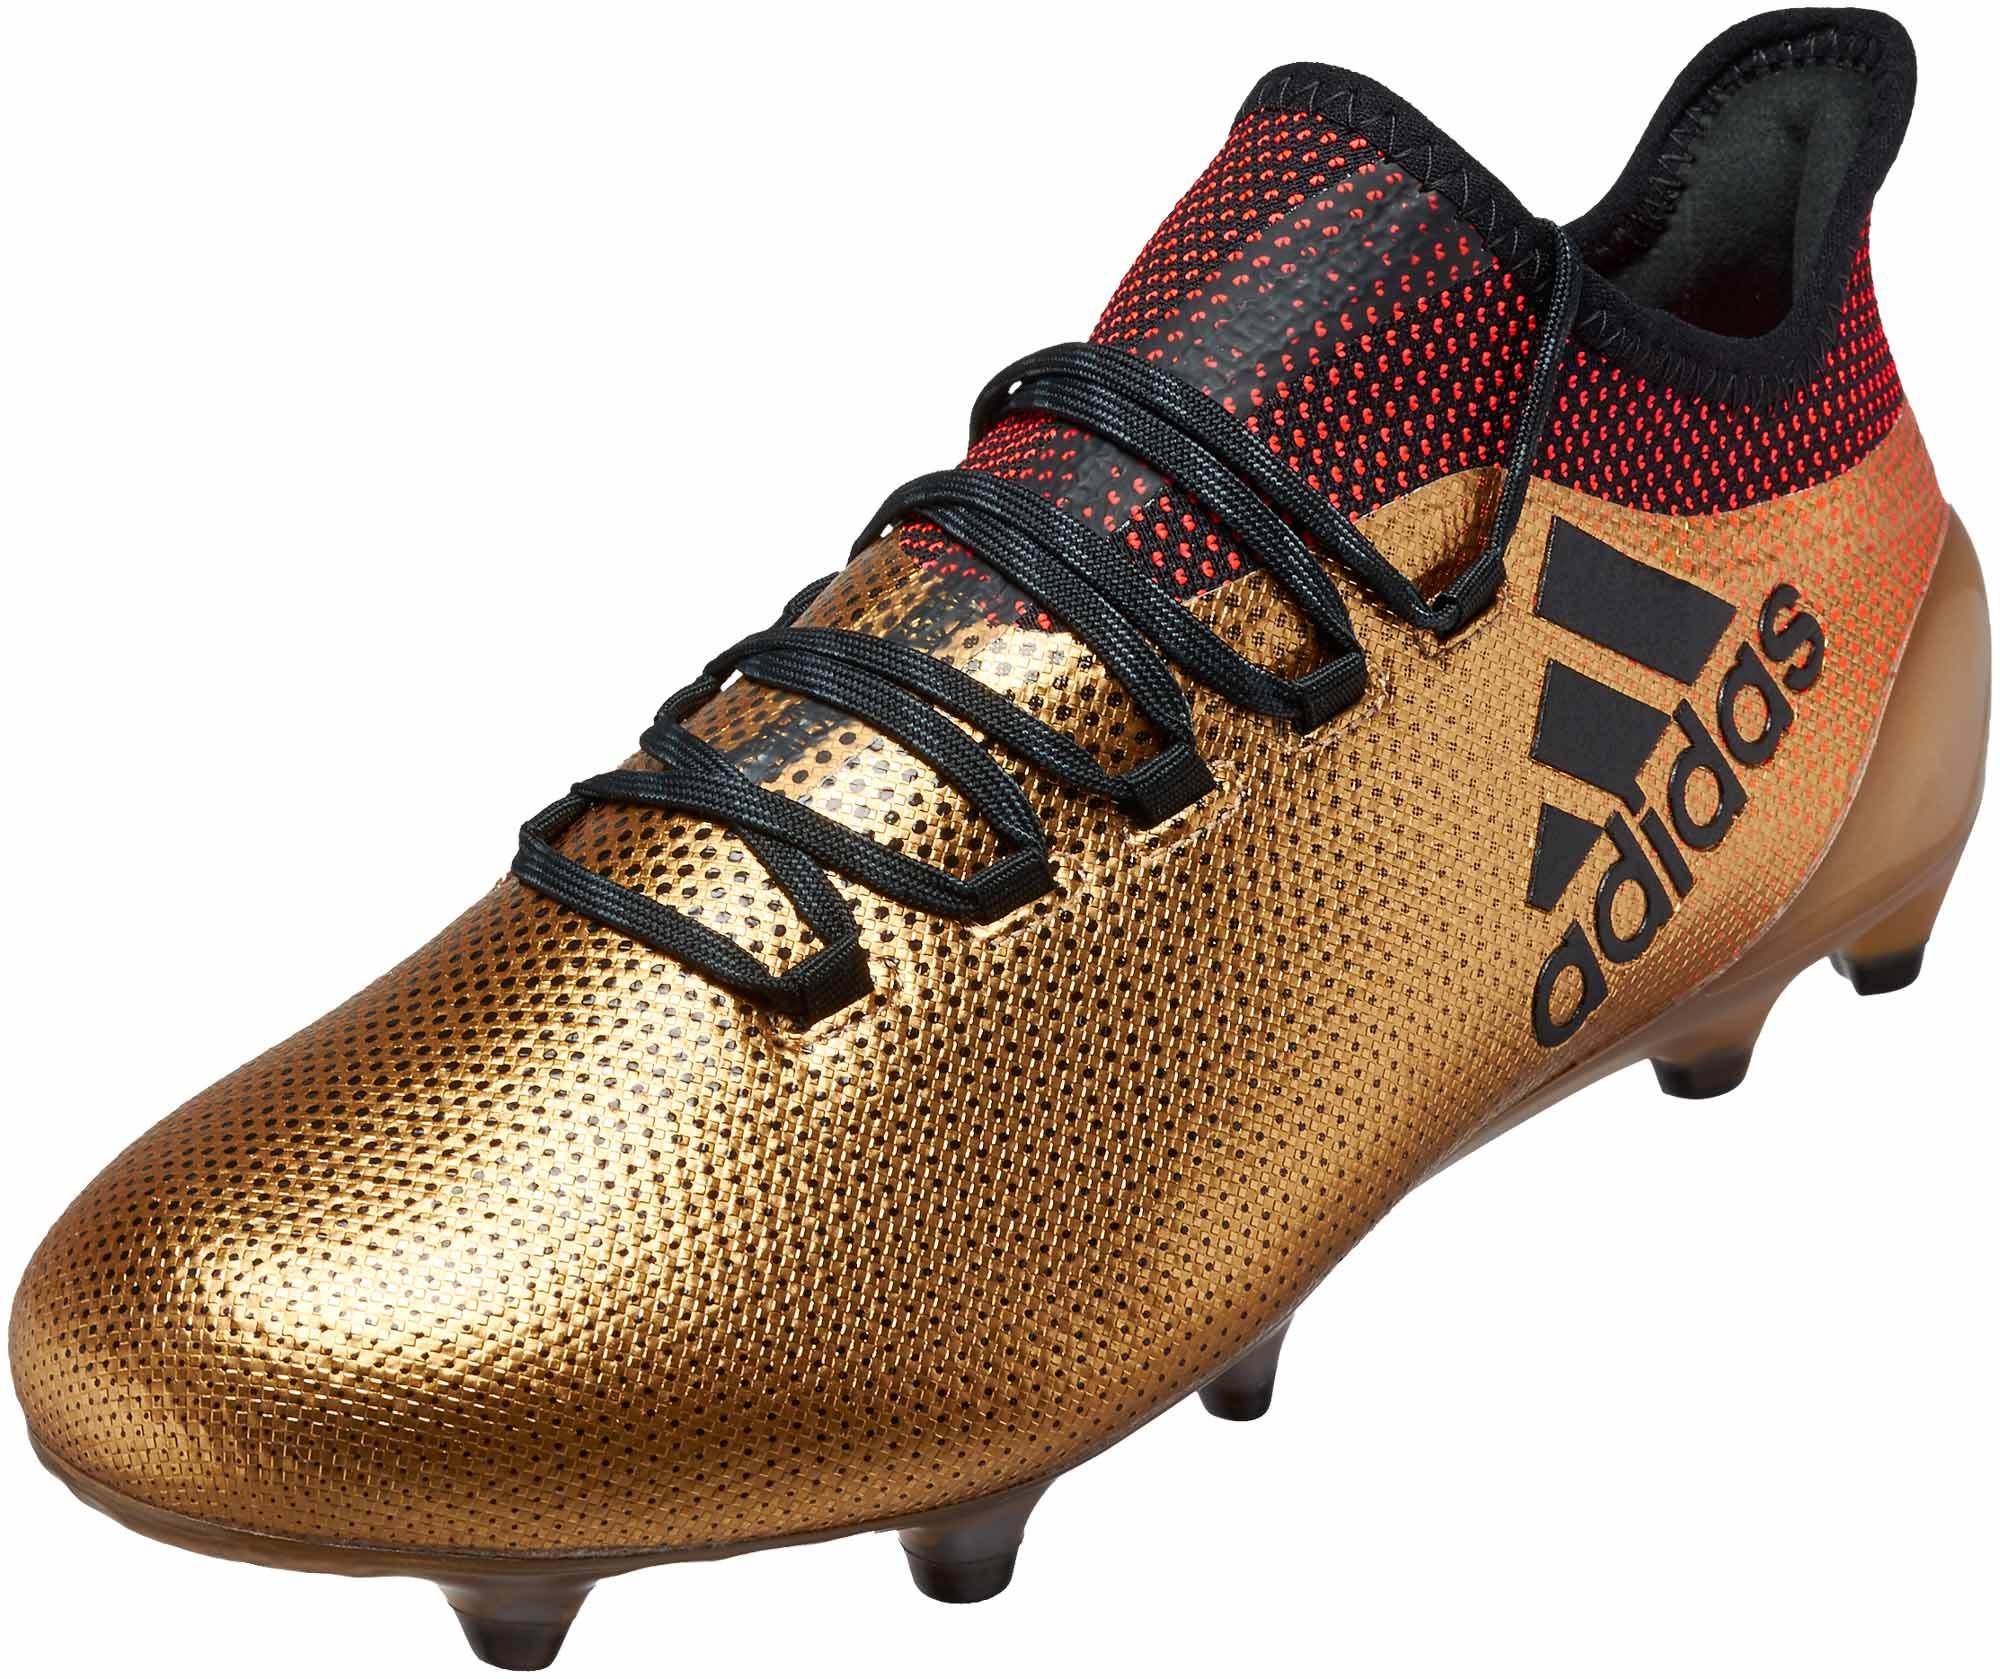 adidas X 17.1 FG - Tactile Gold Metallic Soccer Cleats c42c0af1ee2